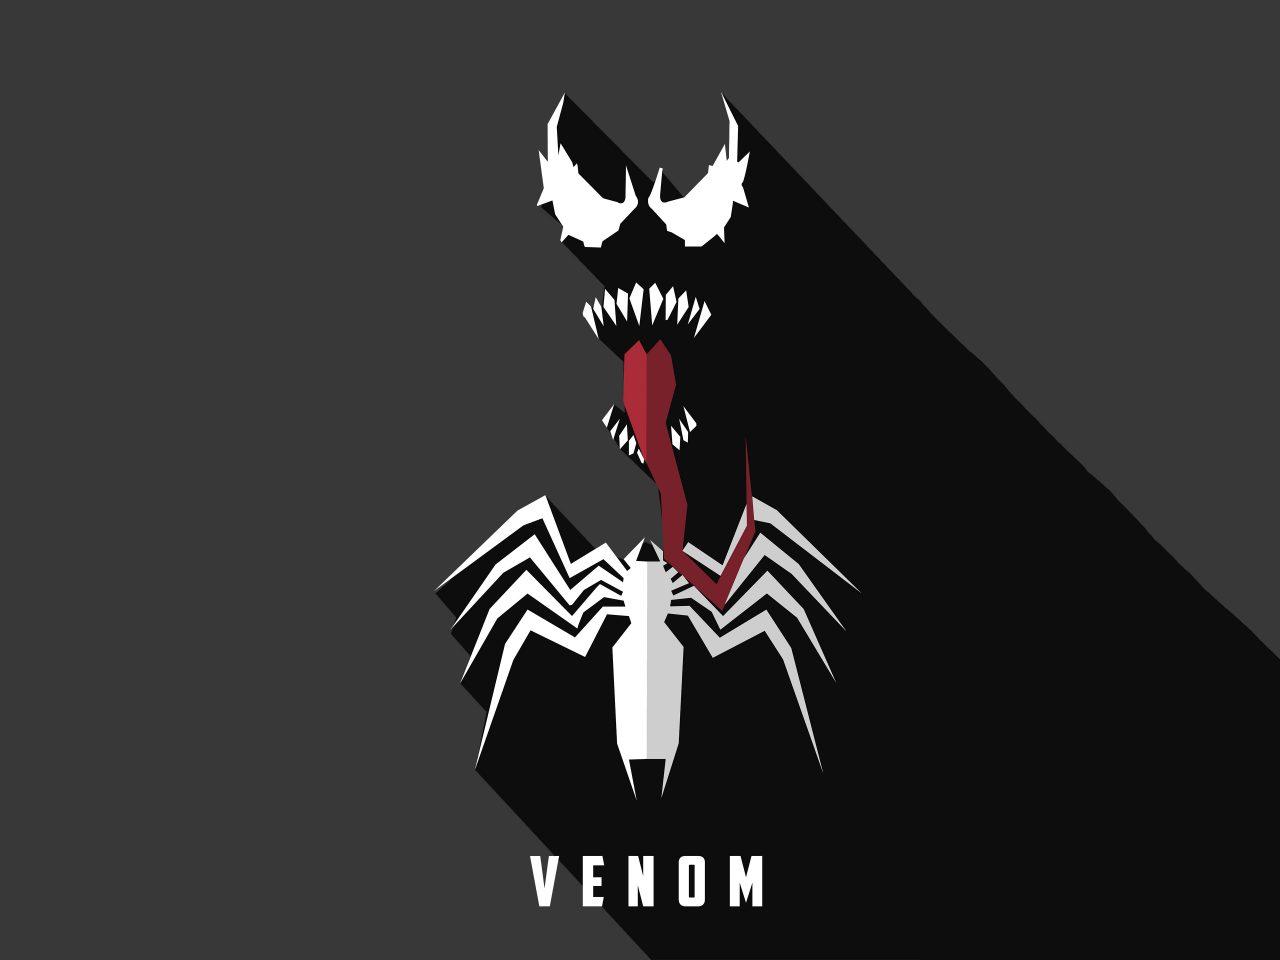 Venom Artwork 5k Wallpaper  Best Wallpapers